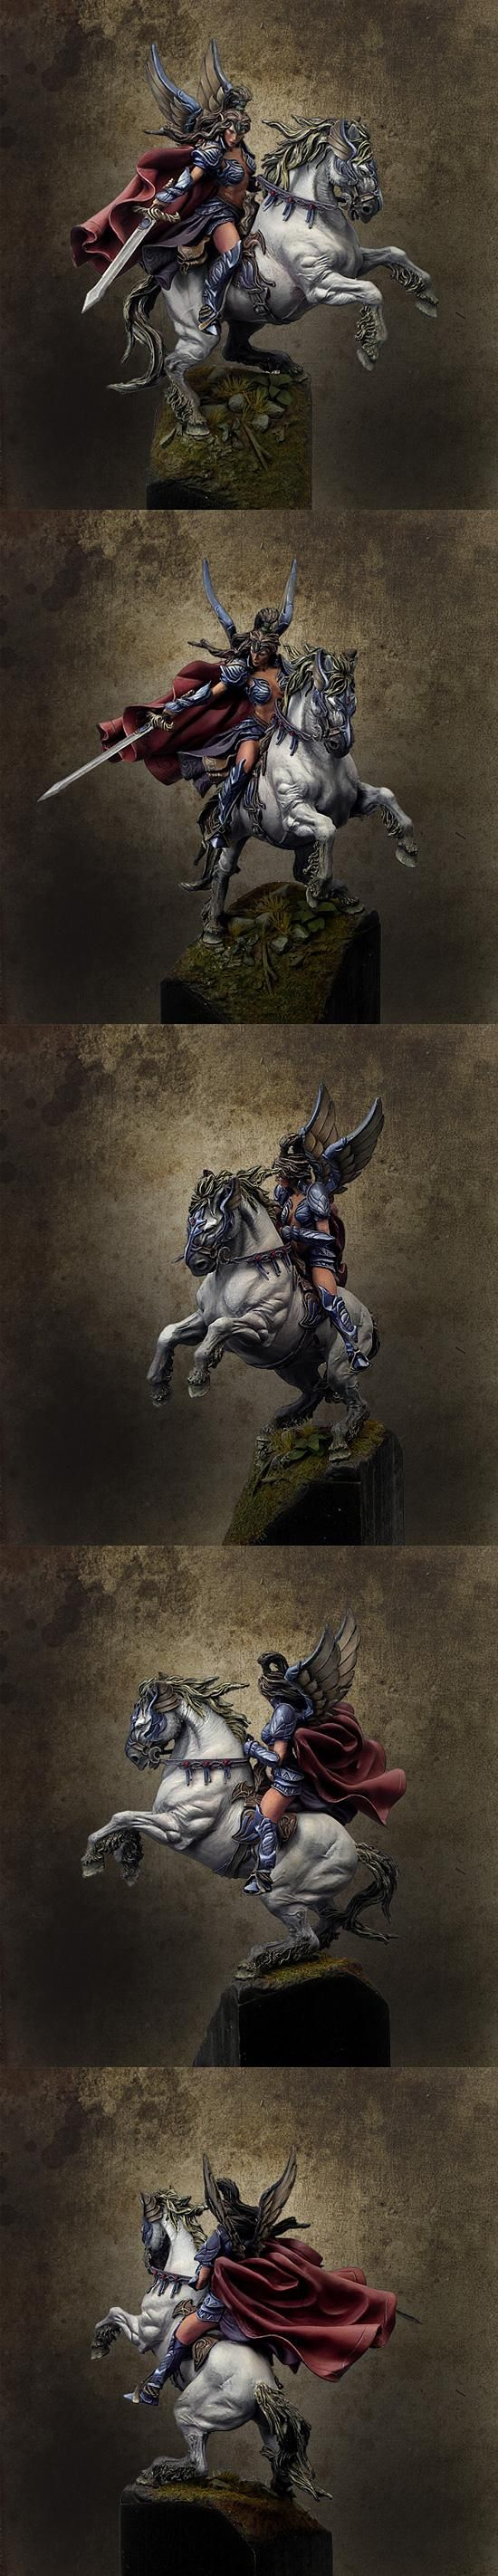 Cloak, Female, Non-Metallic Metal, Rider